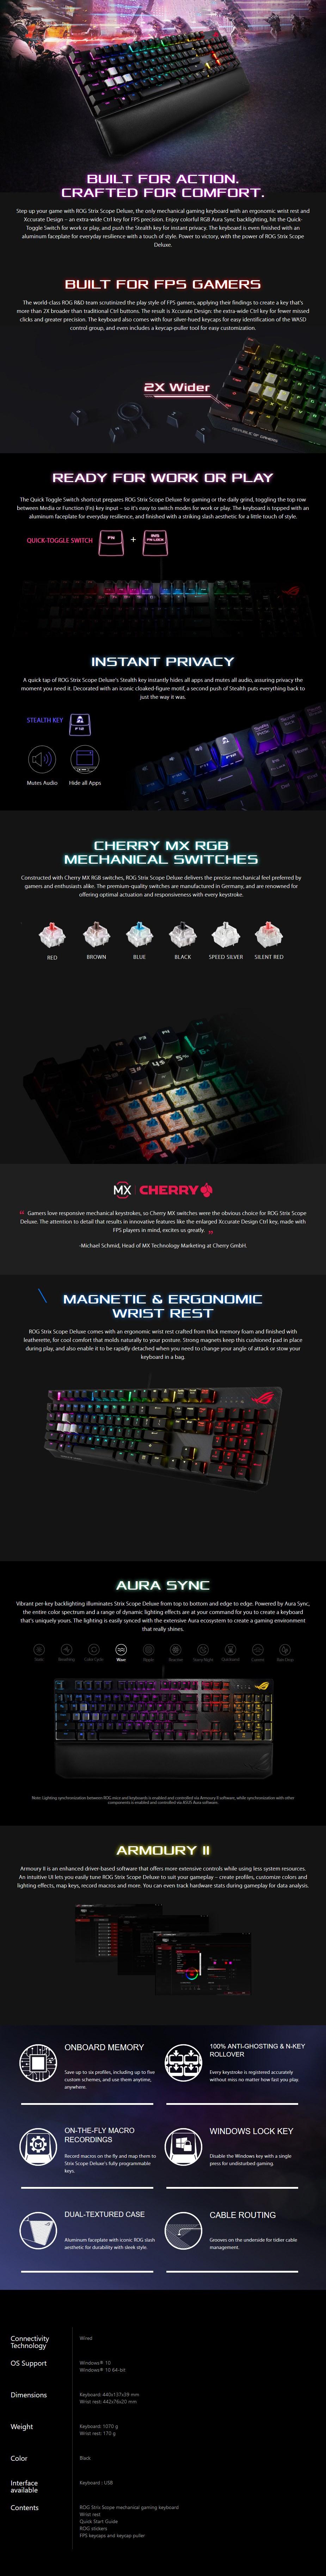 asus-rog-strix-scope-deluxe-rgb-mechanical-gaming-keyboard-cherry-mx-red-ac28584-8-1-.jpg